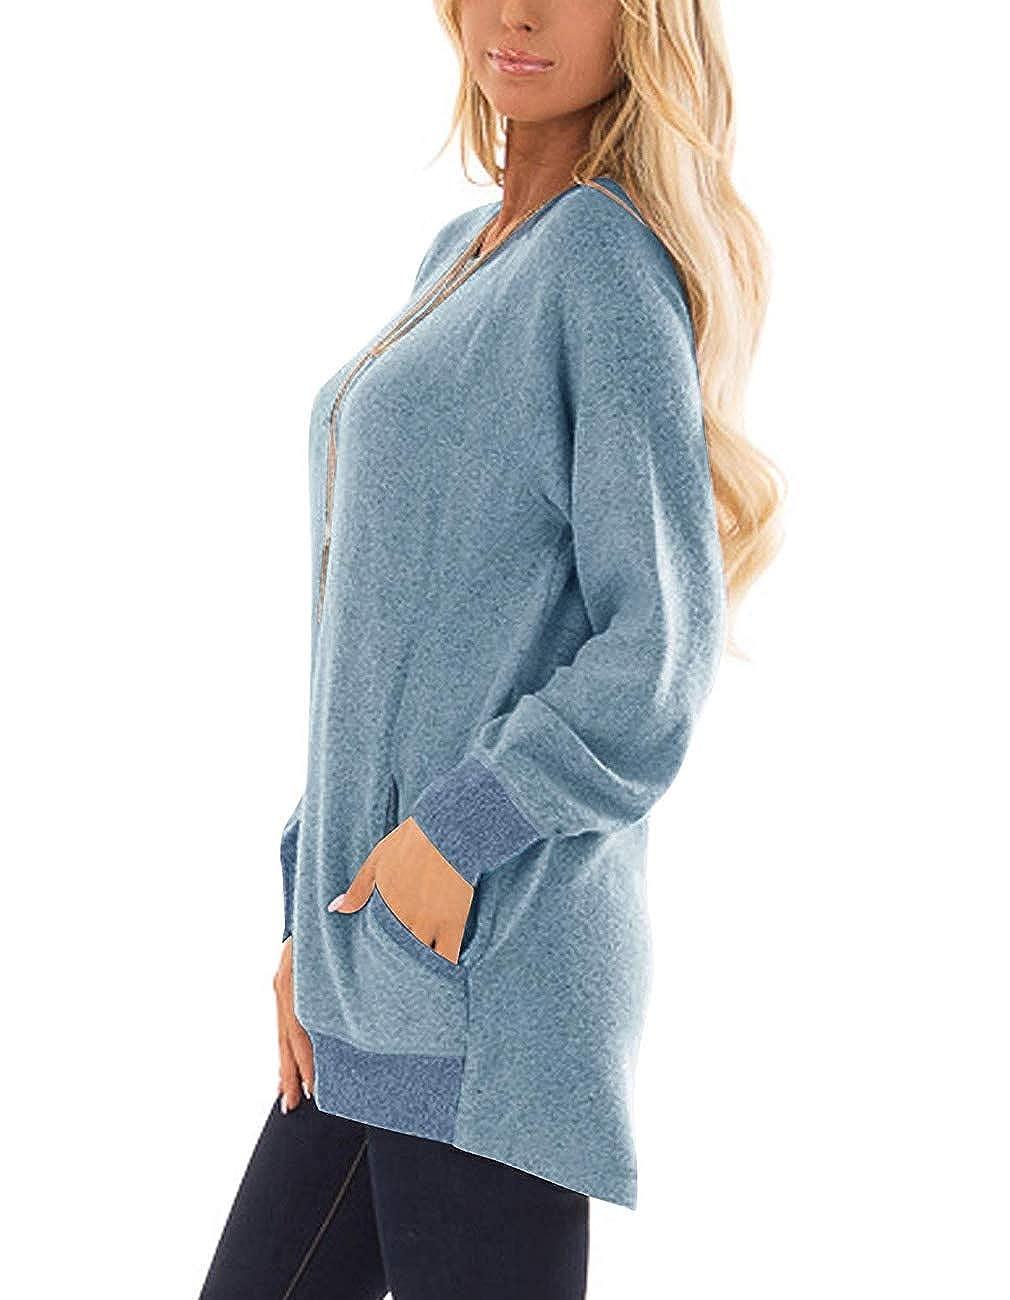 SEHOO Womens Color Block Long Sleeve Crewneck Oversized Sweatshirts Plus Size Tunic Tops